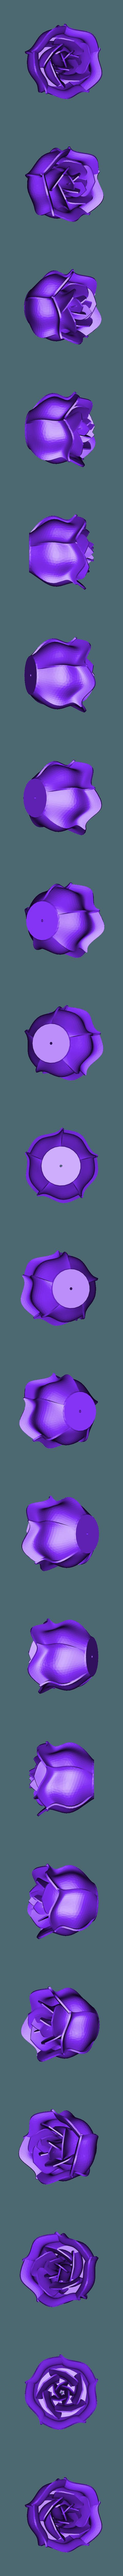 DFX_Rose__ver_3_p1.stl Download STL file happy birthday grandma • 3D print object, ced57